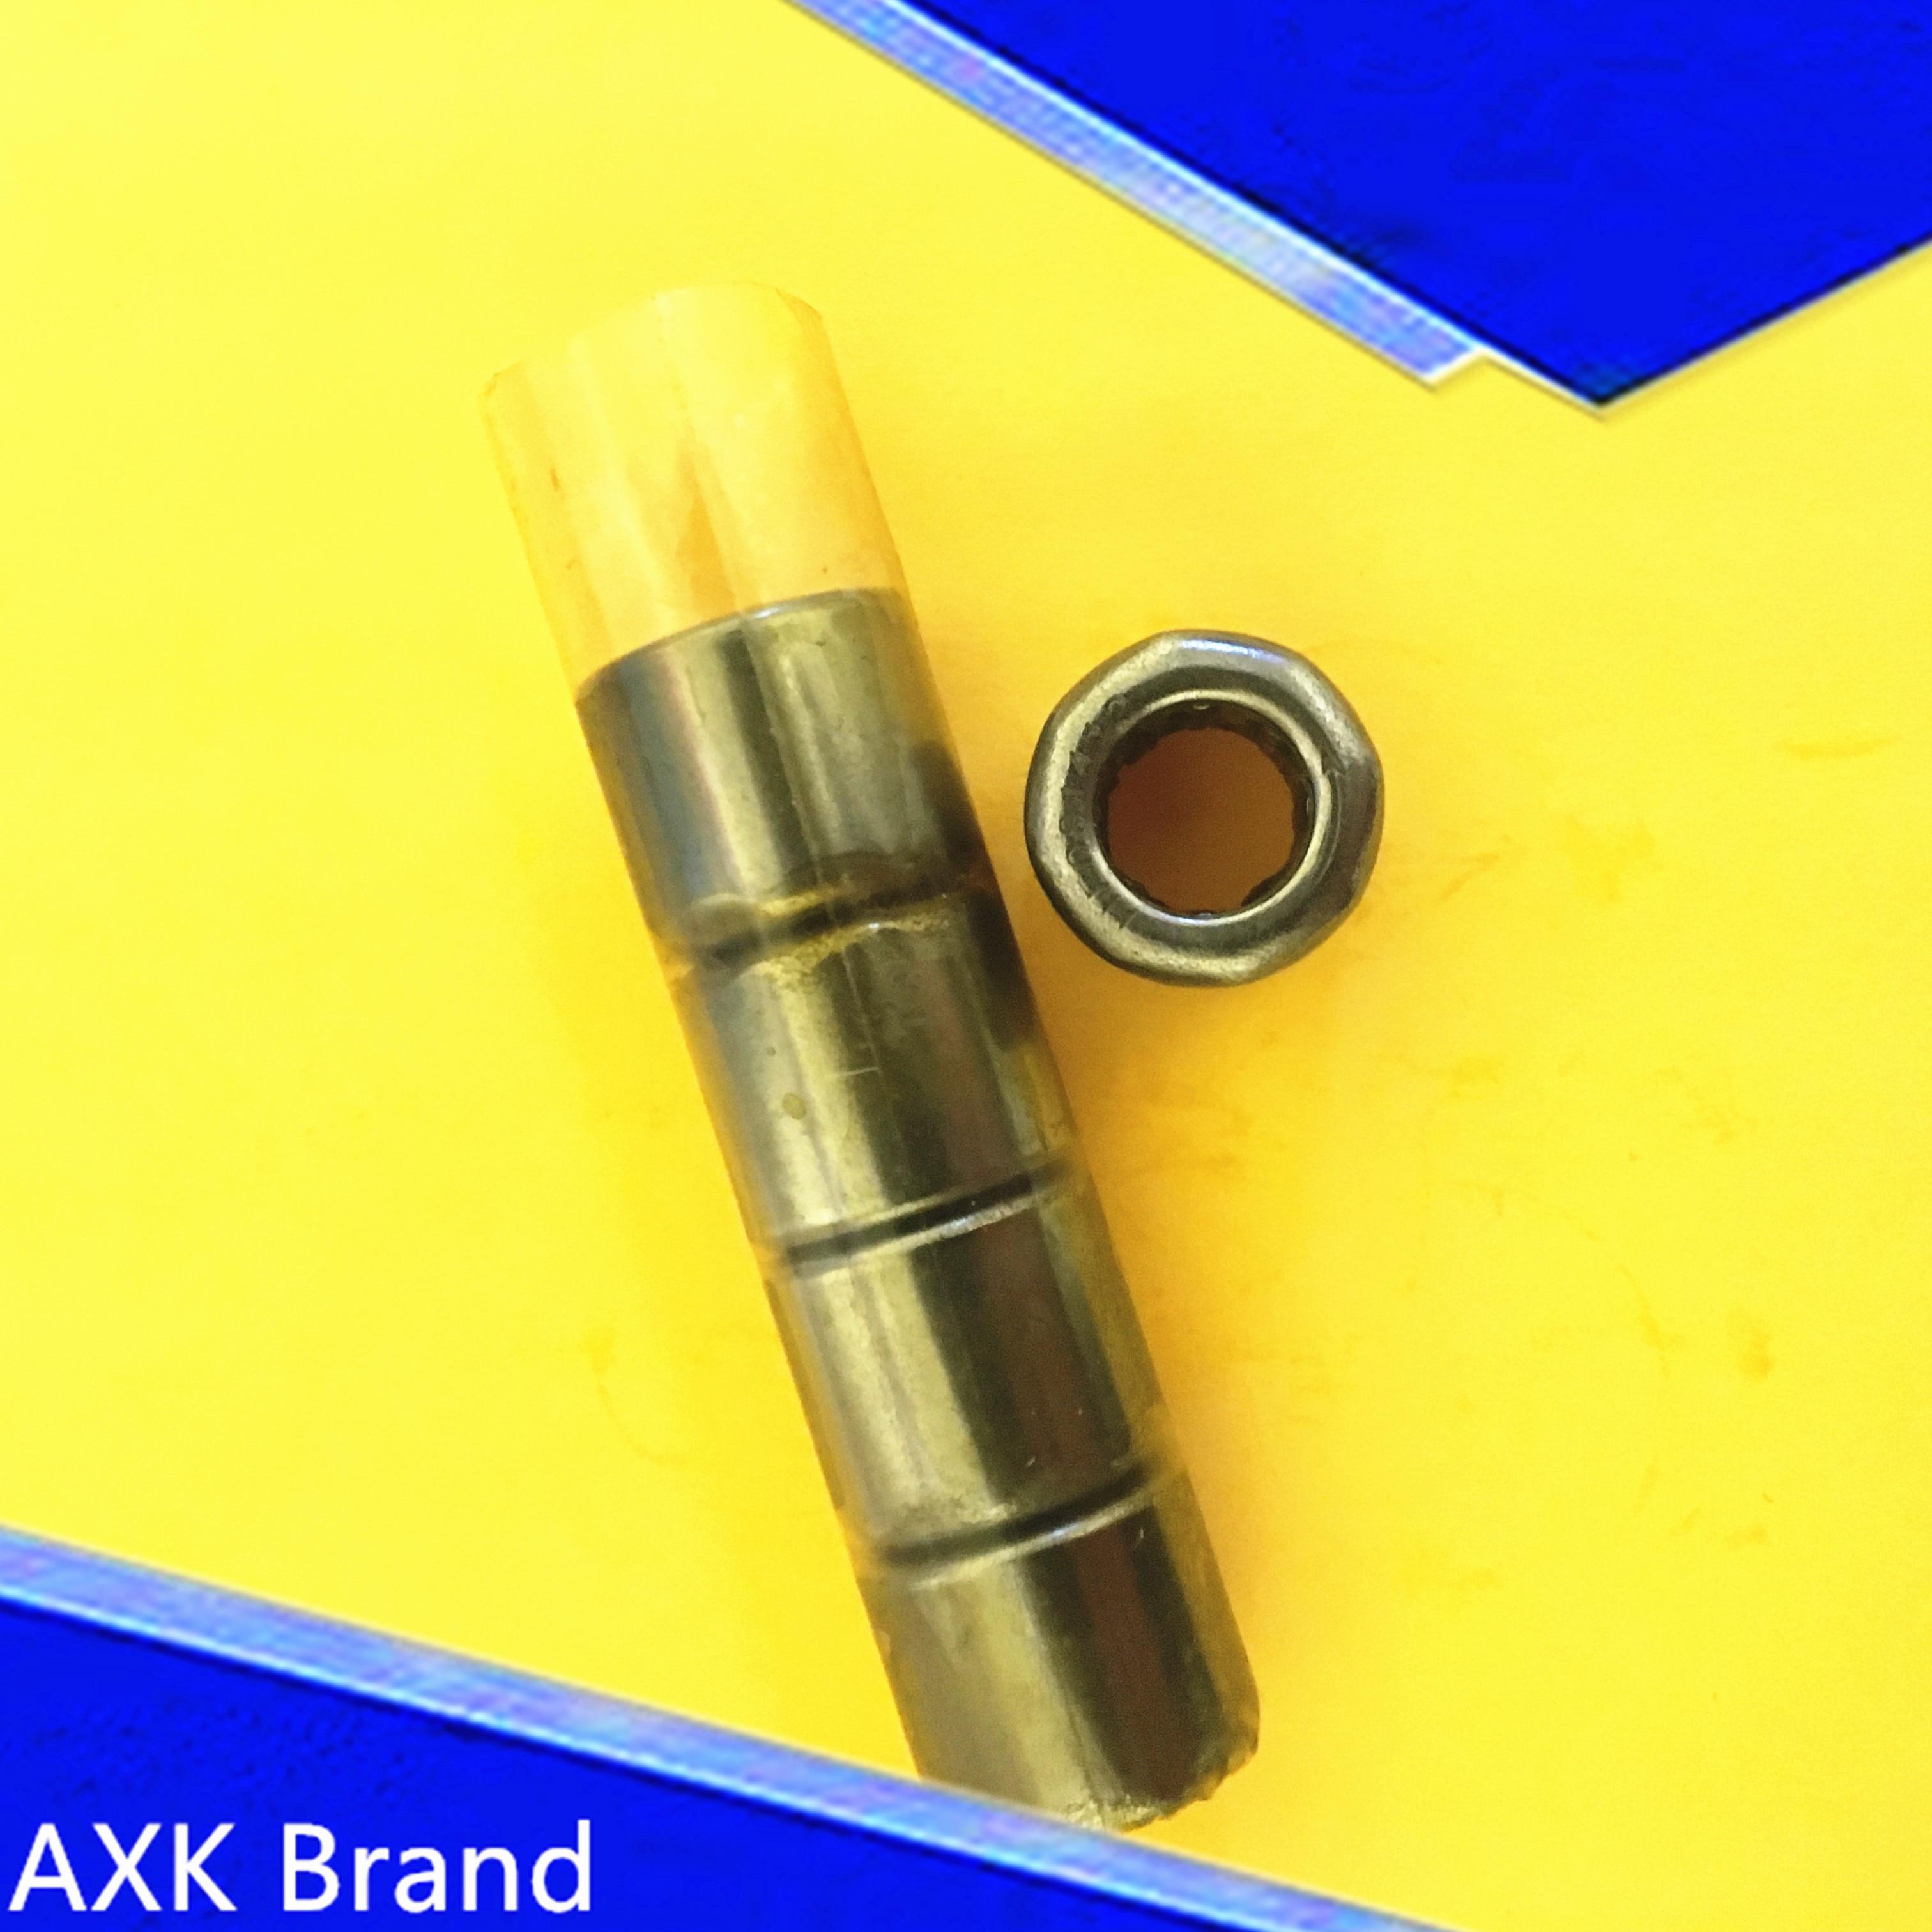 10Pcs HF0612 One Way Needle Bearing 6mm x 10mm x 12mm Free shipping High Quality 10pcs hf0612 one way cluth needle roller bearing 6x10x12mm